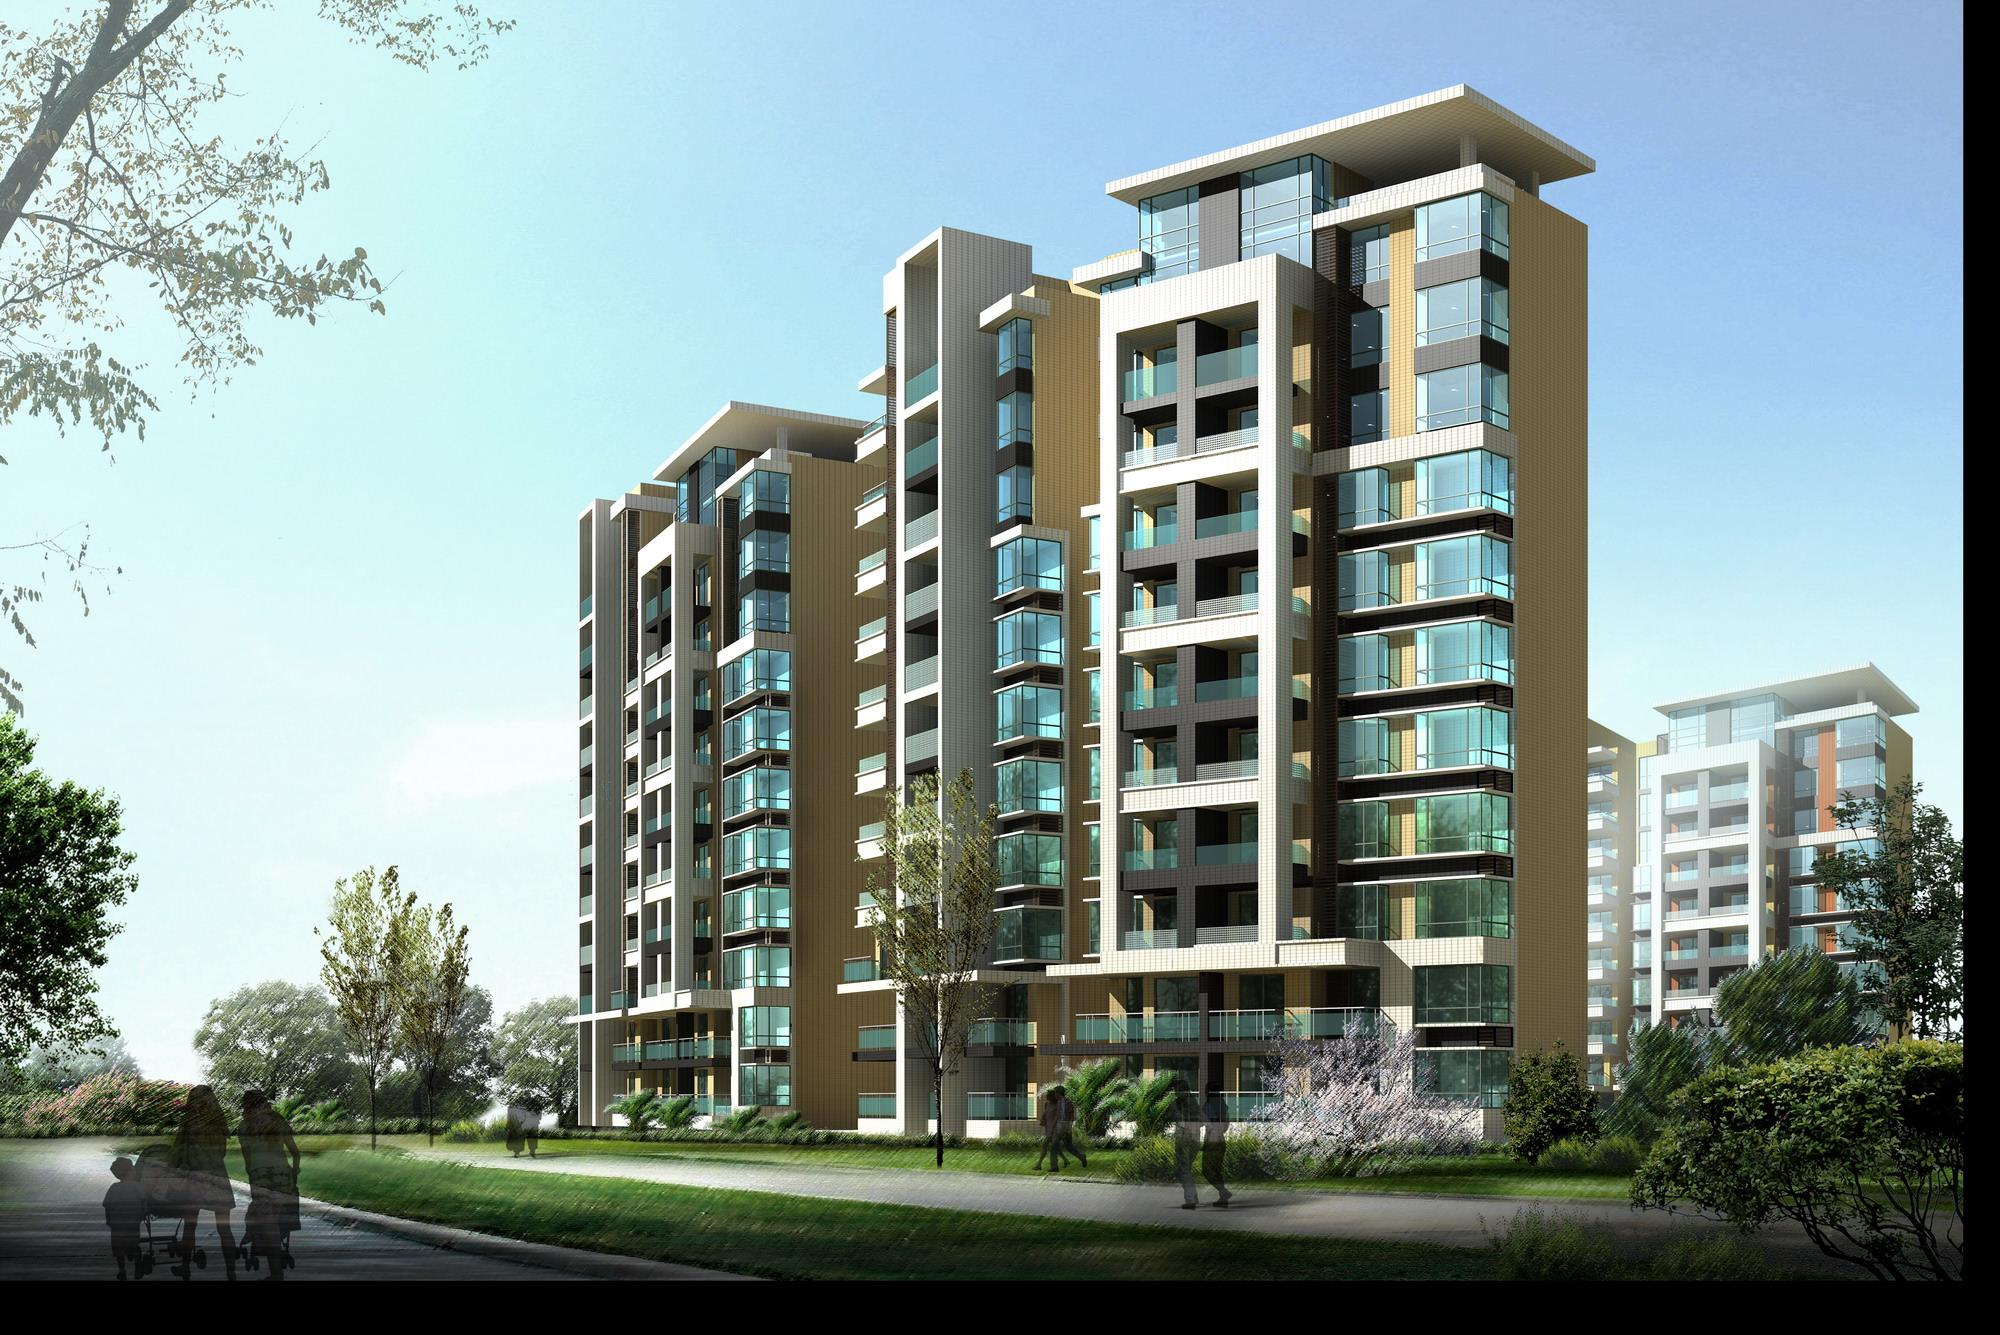 Posh Apartment With Aristocratic Decor 3d Model Max 3ds 1 ...